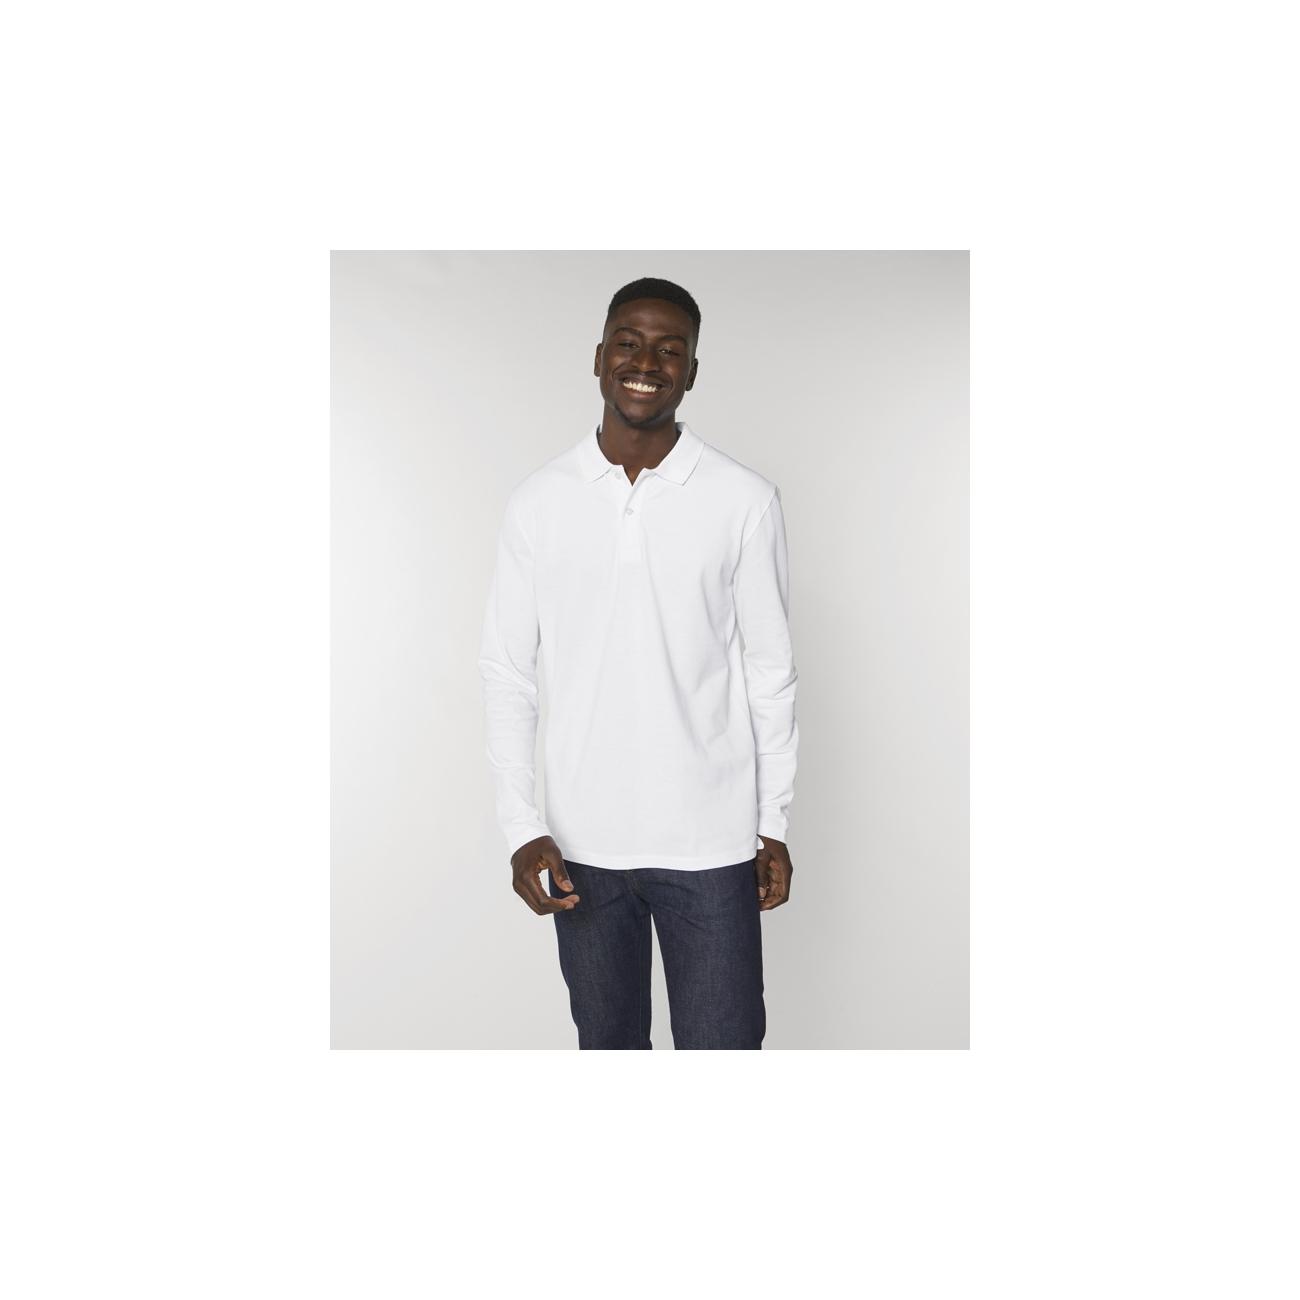 https://tee-shirt-bio.com/9796-thickbox_default/polo-coton-pique-manches-longues-blanc.jpg